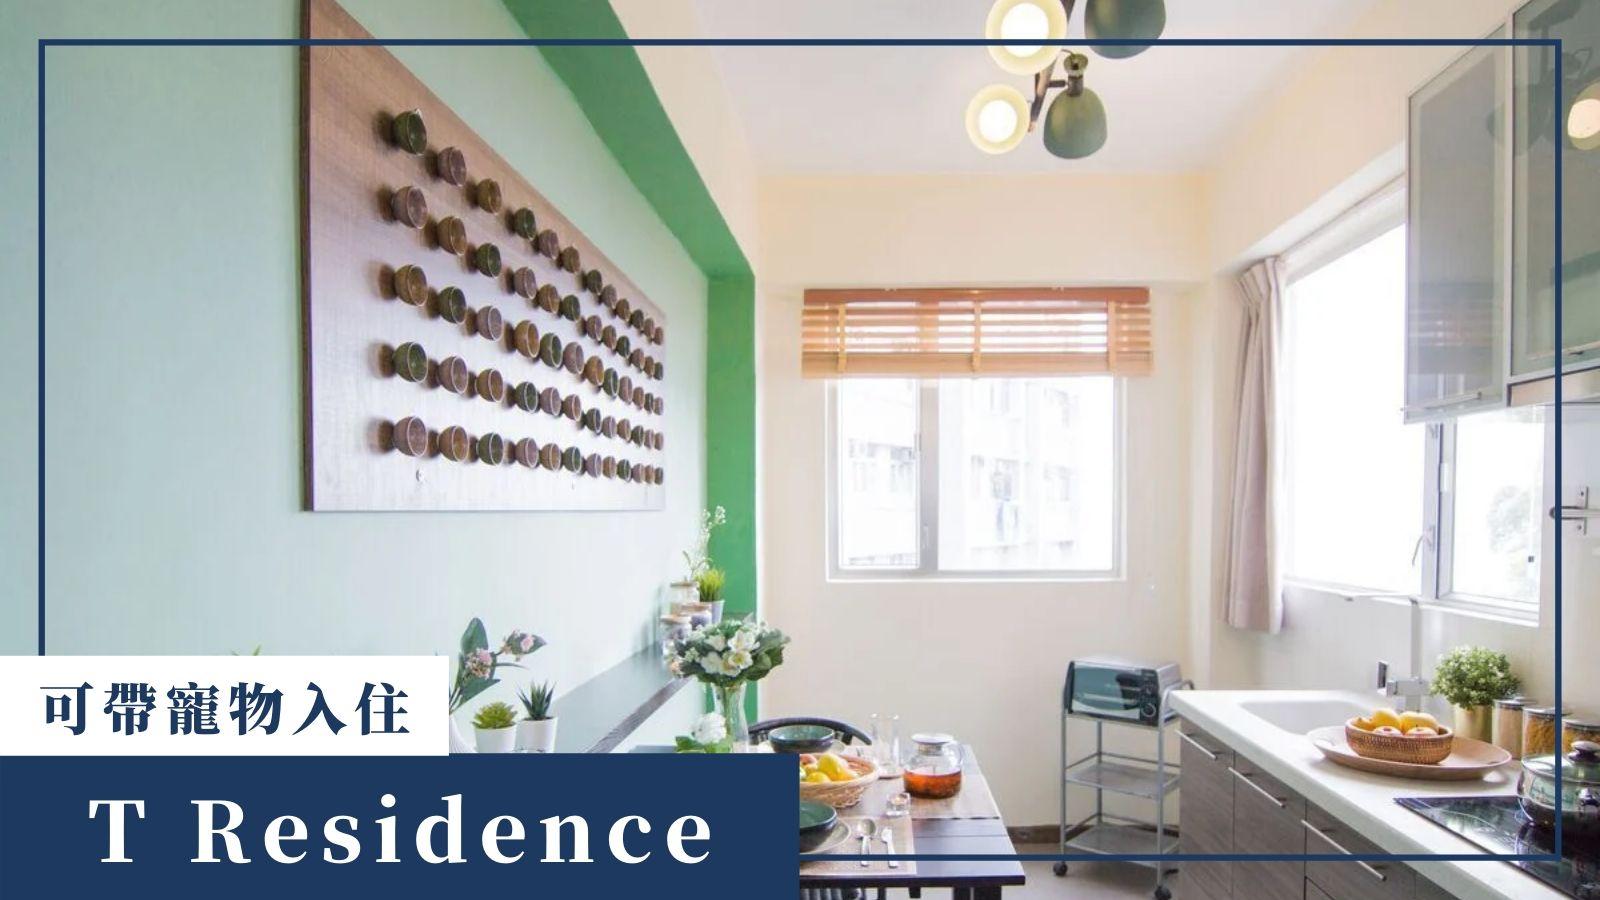 可養寵物服務式住宅-TResidence